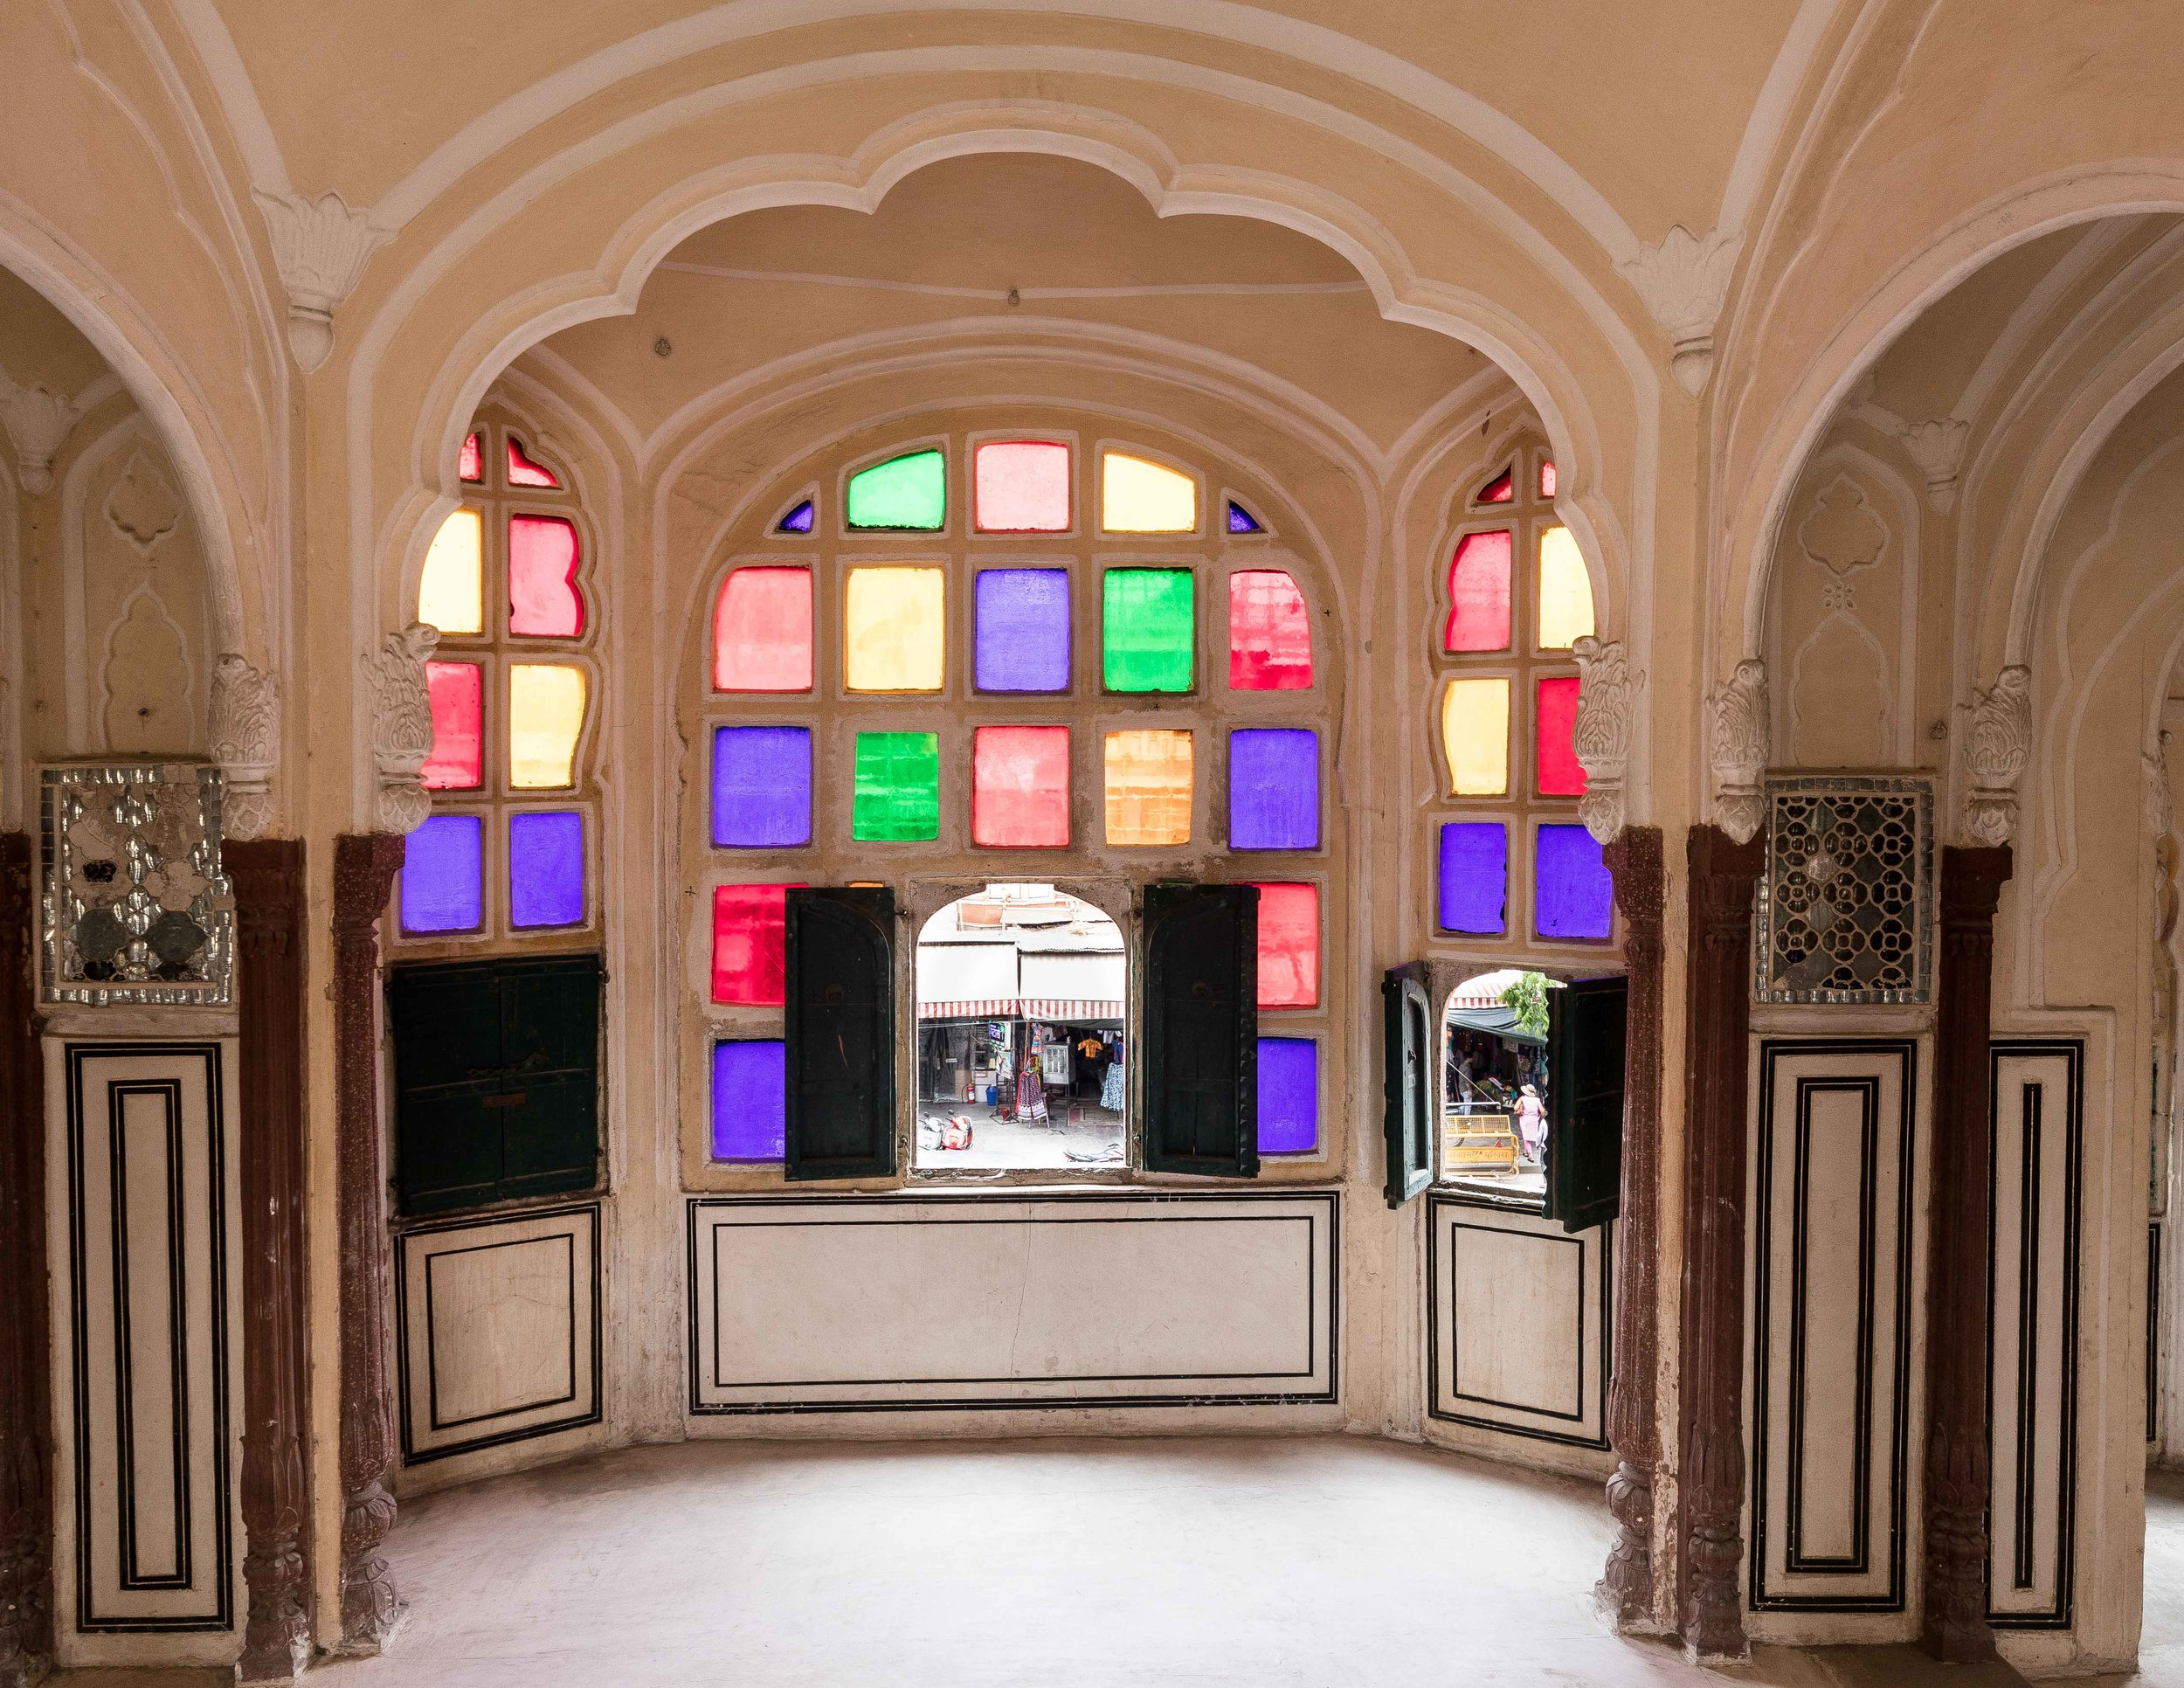 Places to visit in Jaipur - Hawa Mahal